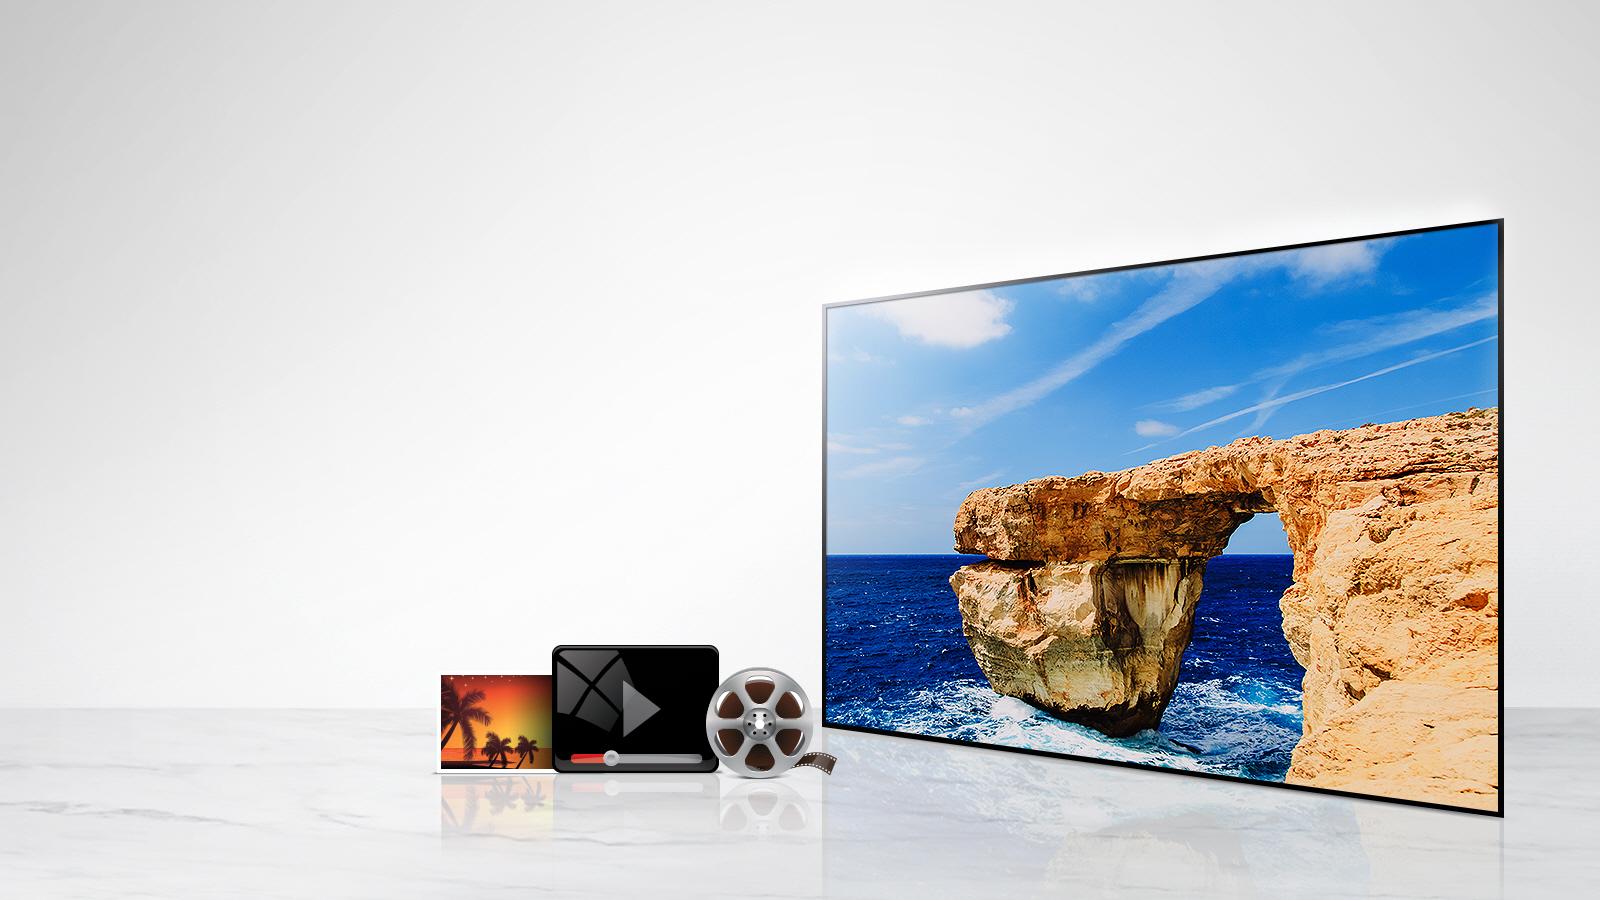 Tivi LG 43LJ510T (Led TV, Full HD, 43 Inch)